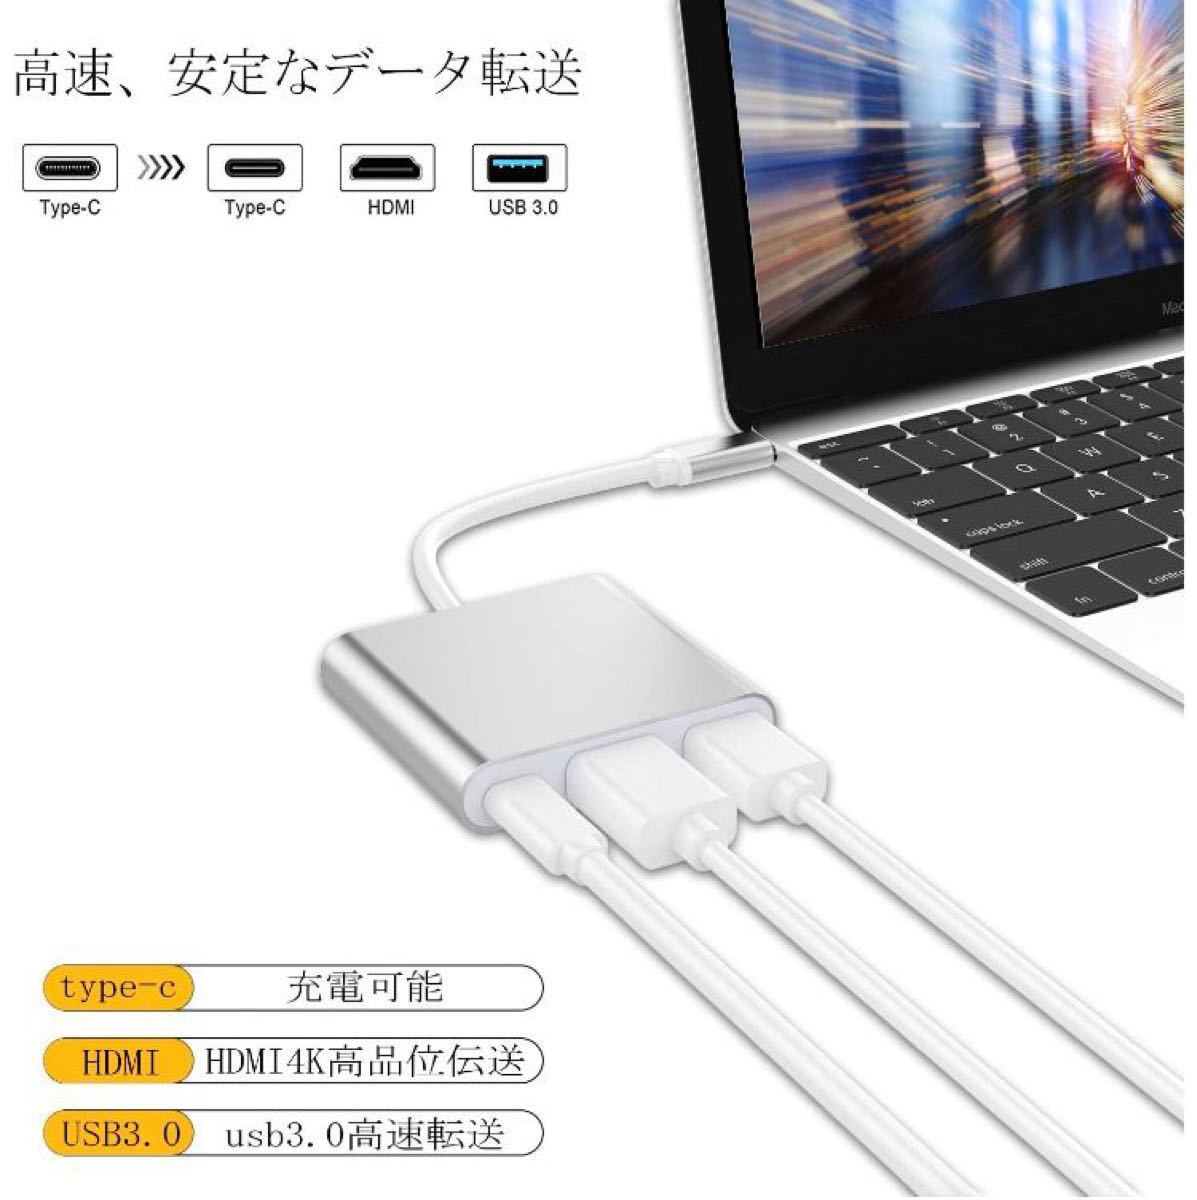 Type-C変換 アダプター HDMI 4k USB スイッチswitch対応